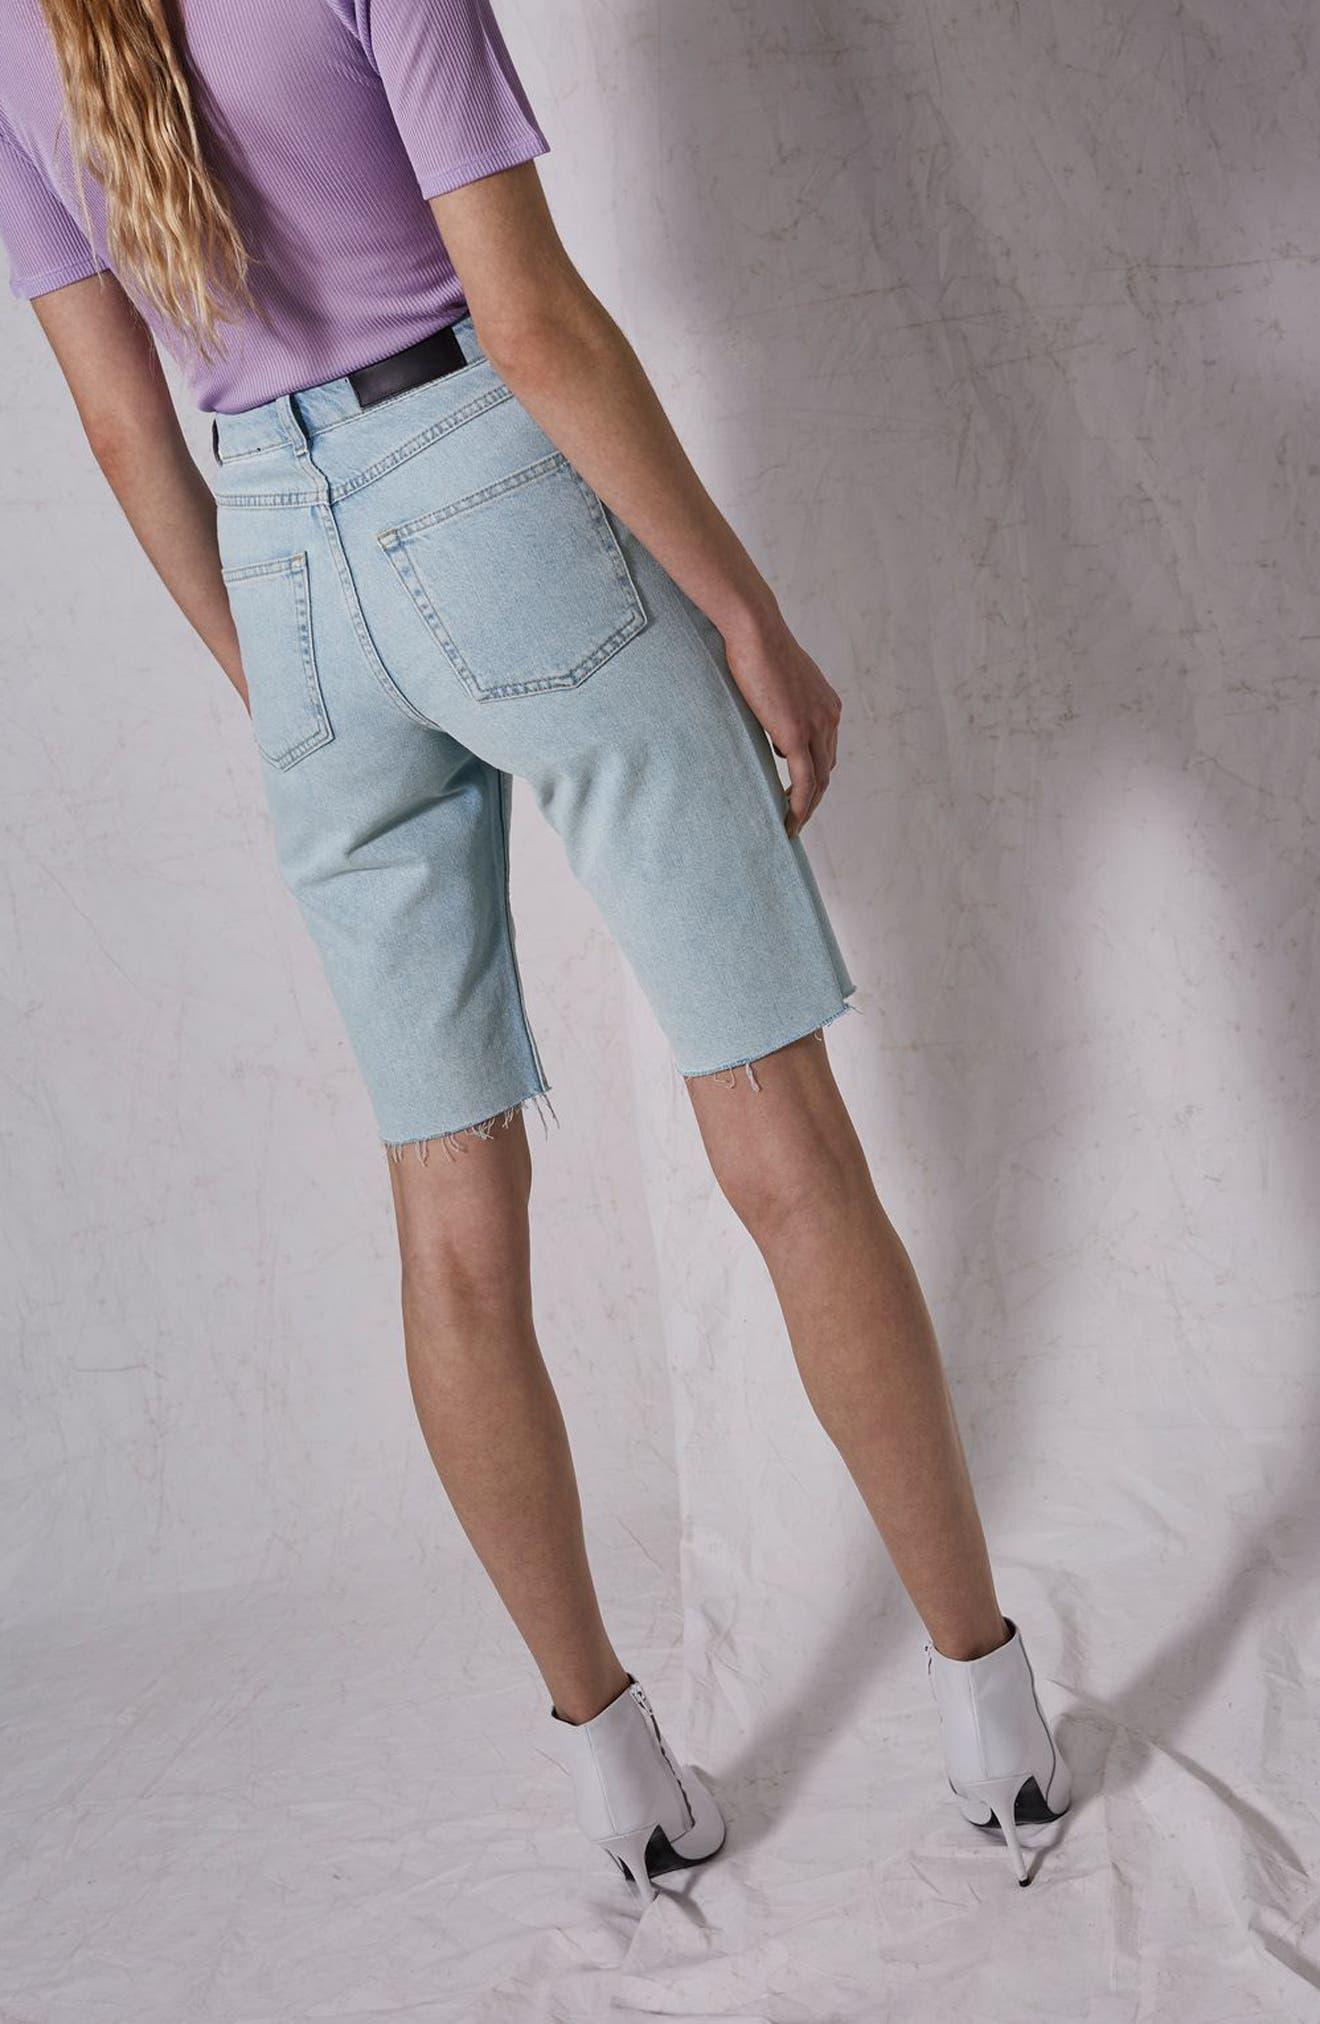 Bleach Denim Board Shorts,                             Alternate thumbnail 11, color,                             420